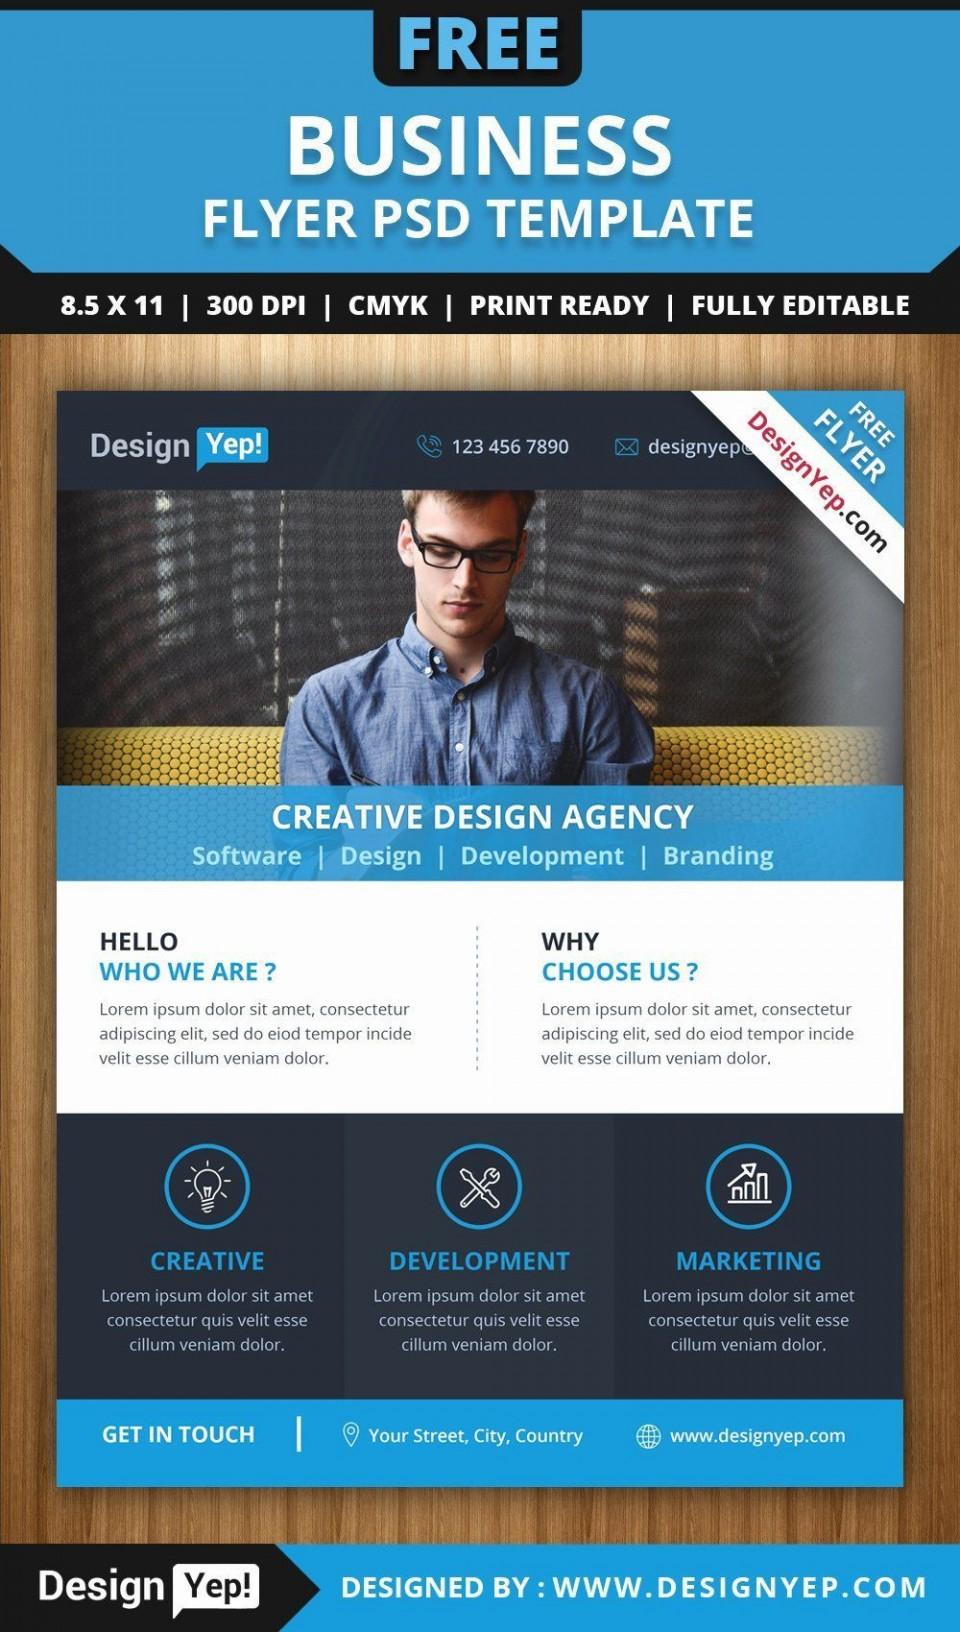 001 Singular Busines Flyer Template Free Download Concept  Photoshop Training Design960